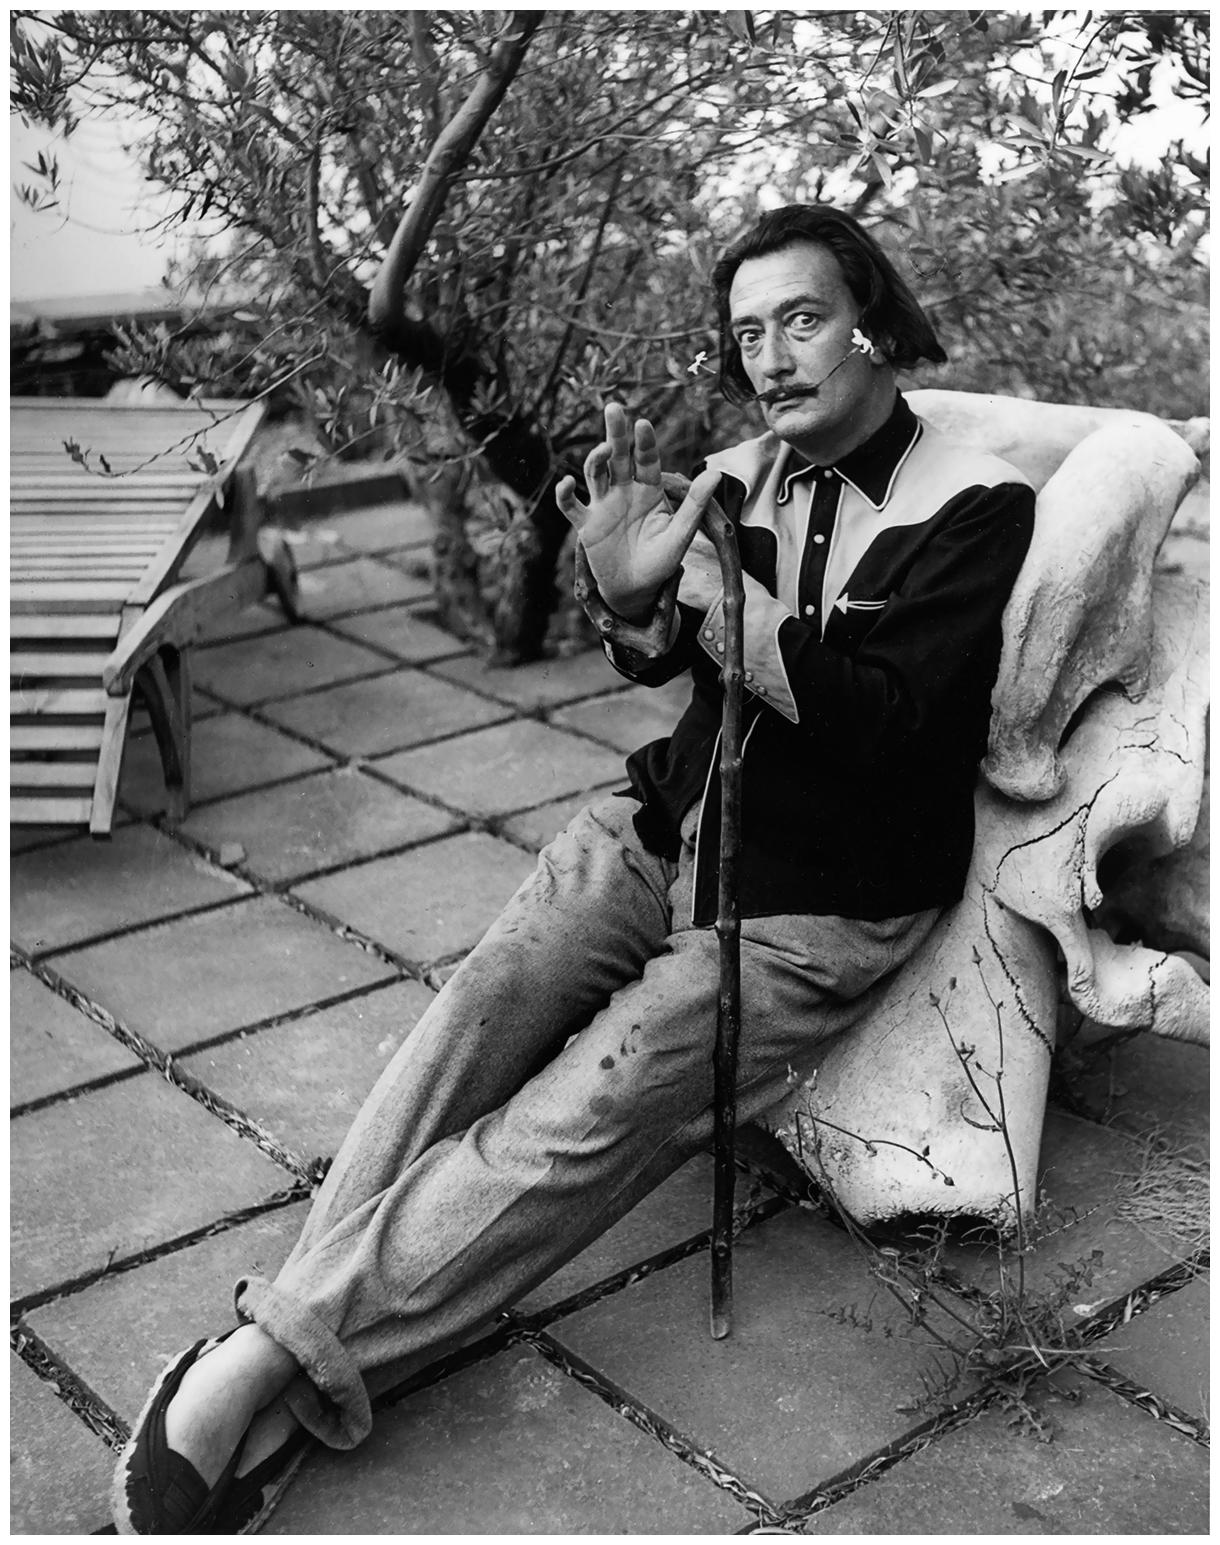 The Surrealist Style Of Salvador Dali